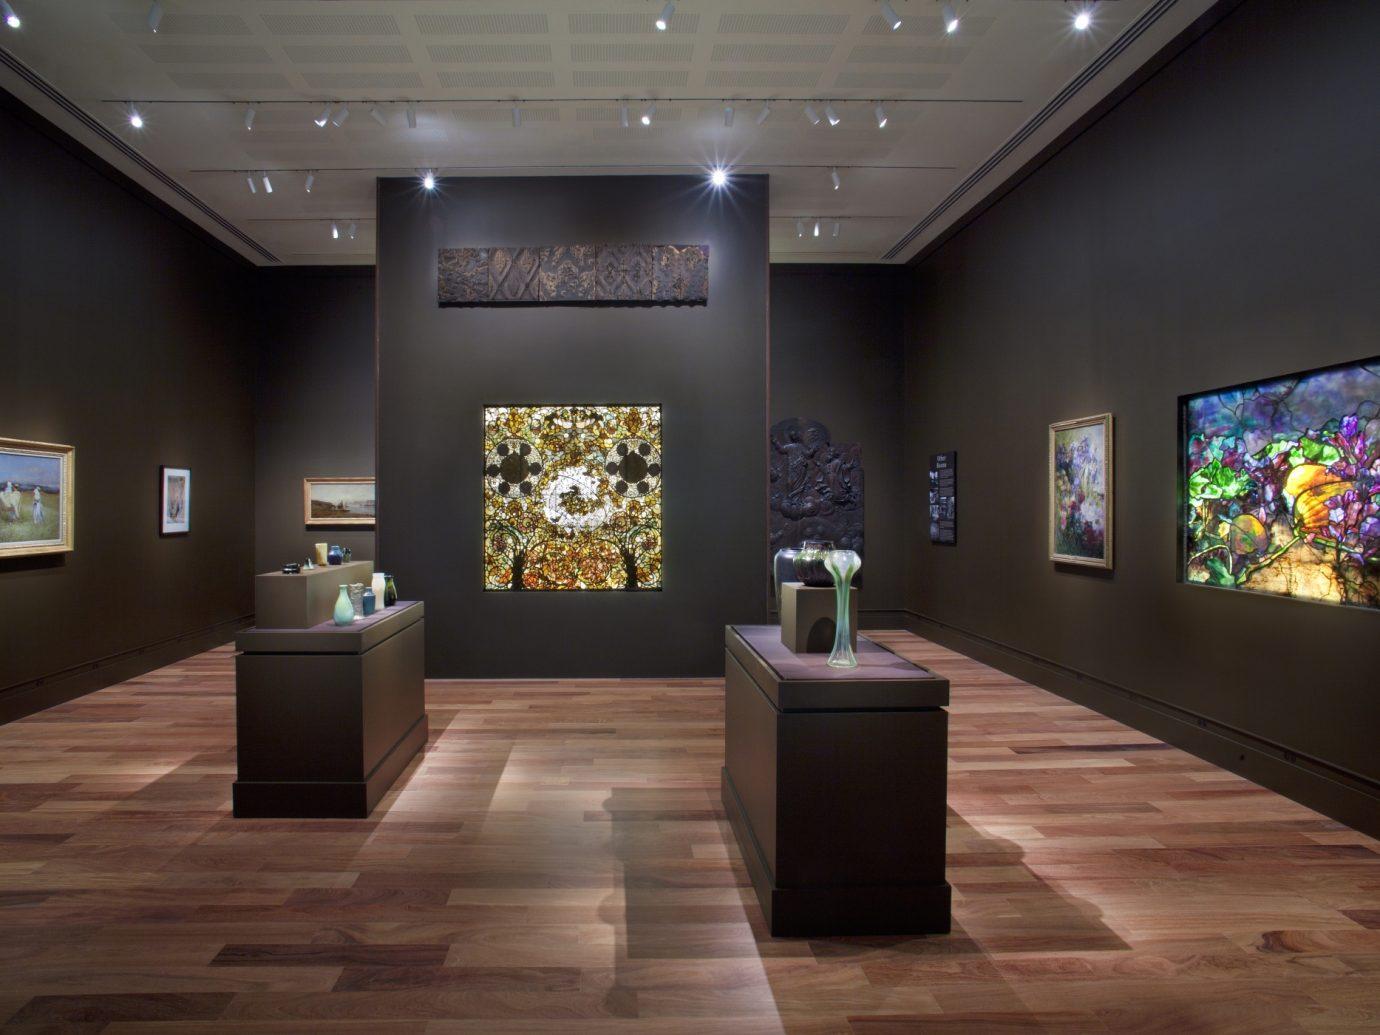 gallery hall at Charles Hosmer Morse Museum of American Art